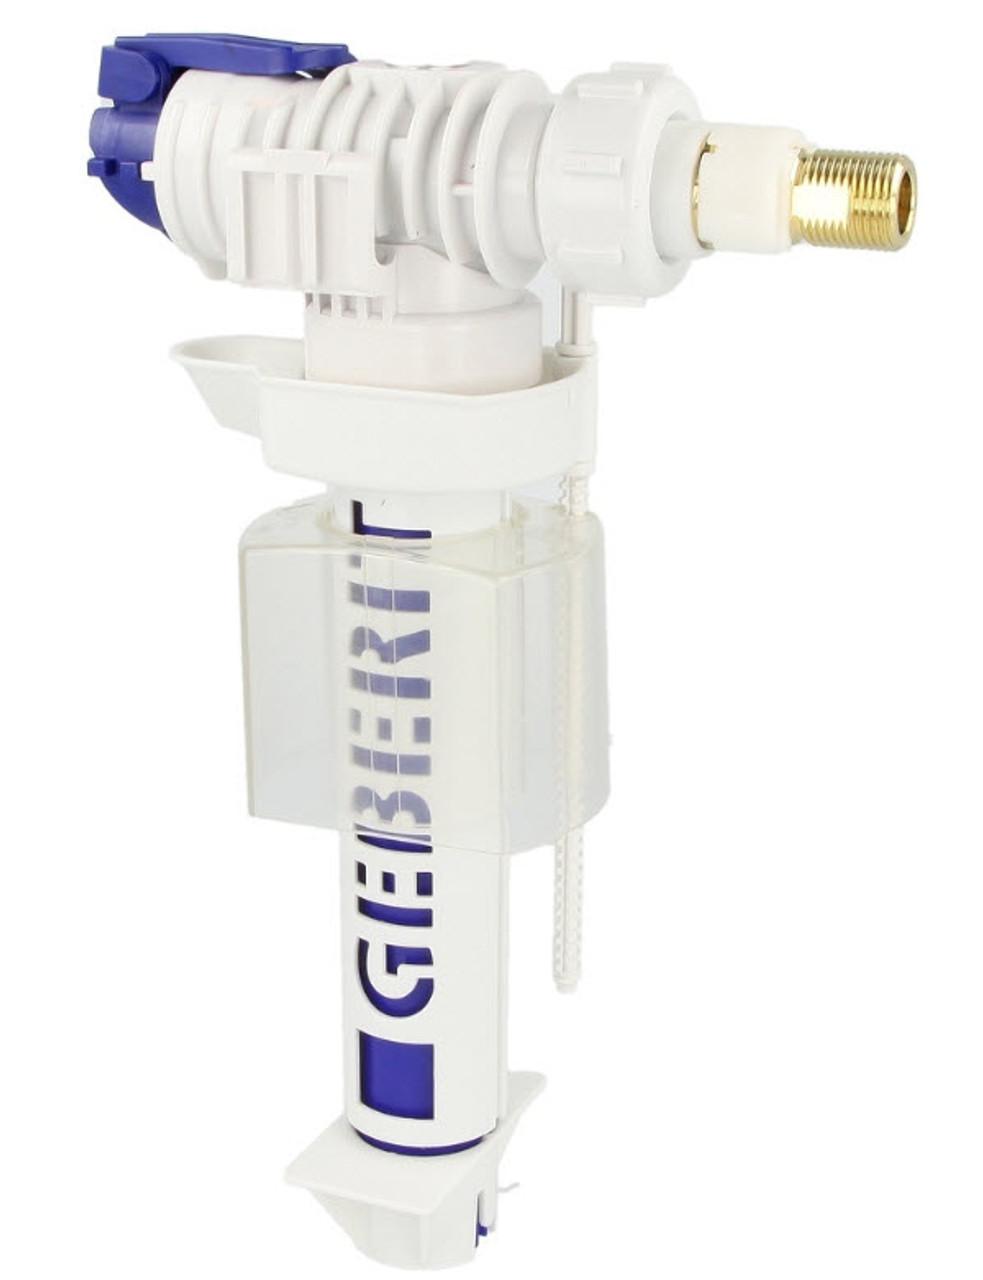 Geberit Unifill universal filling valve concealed